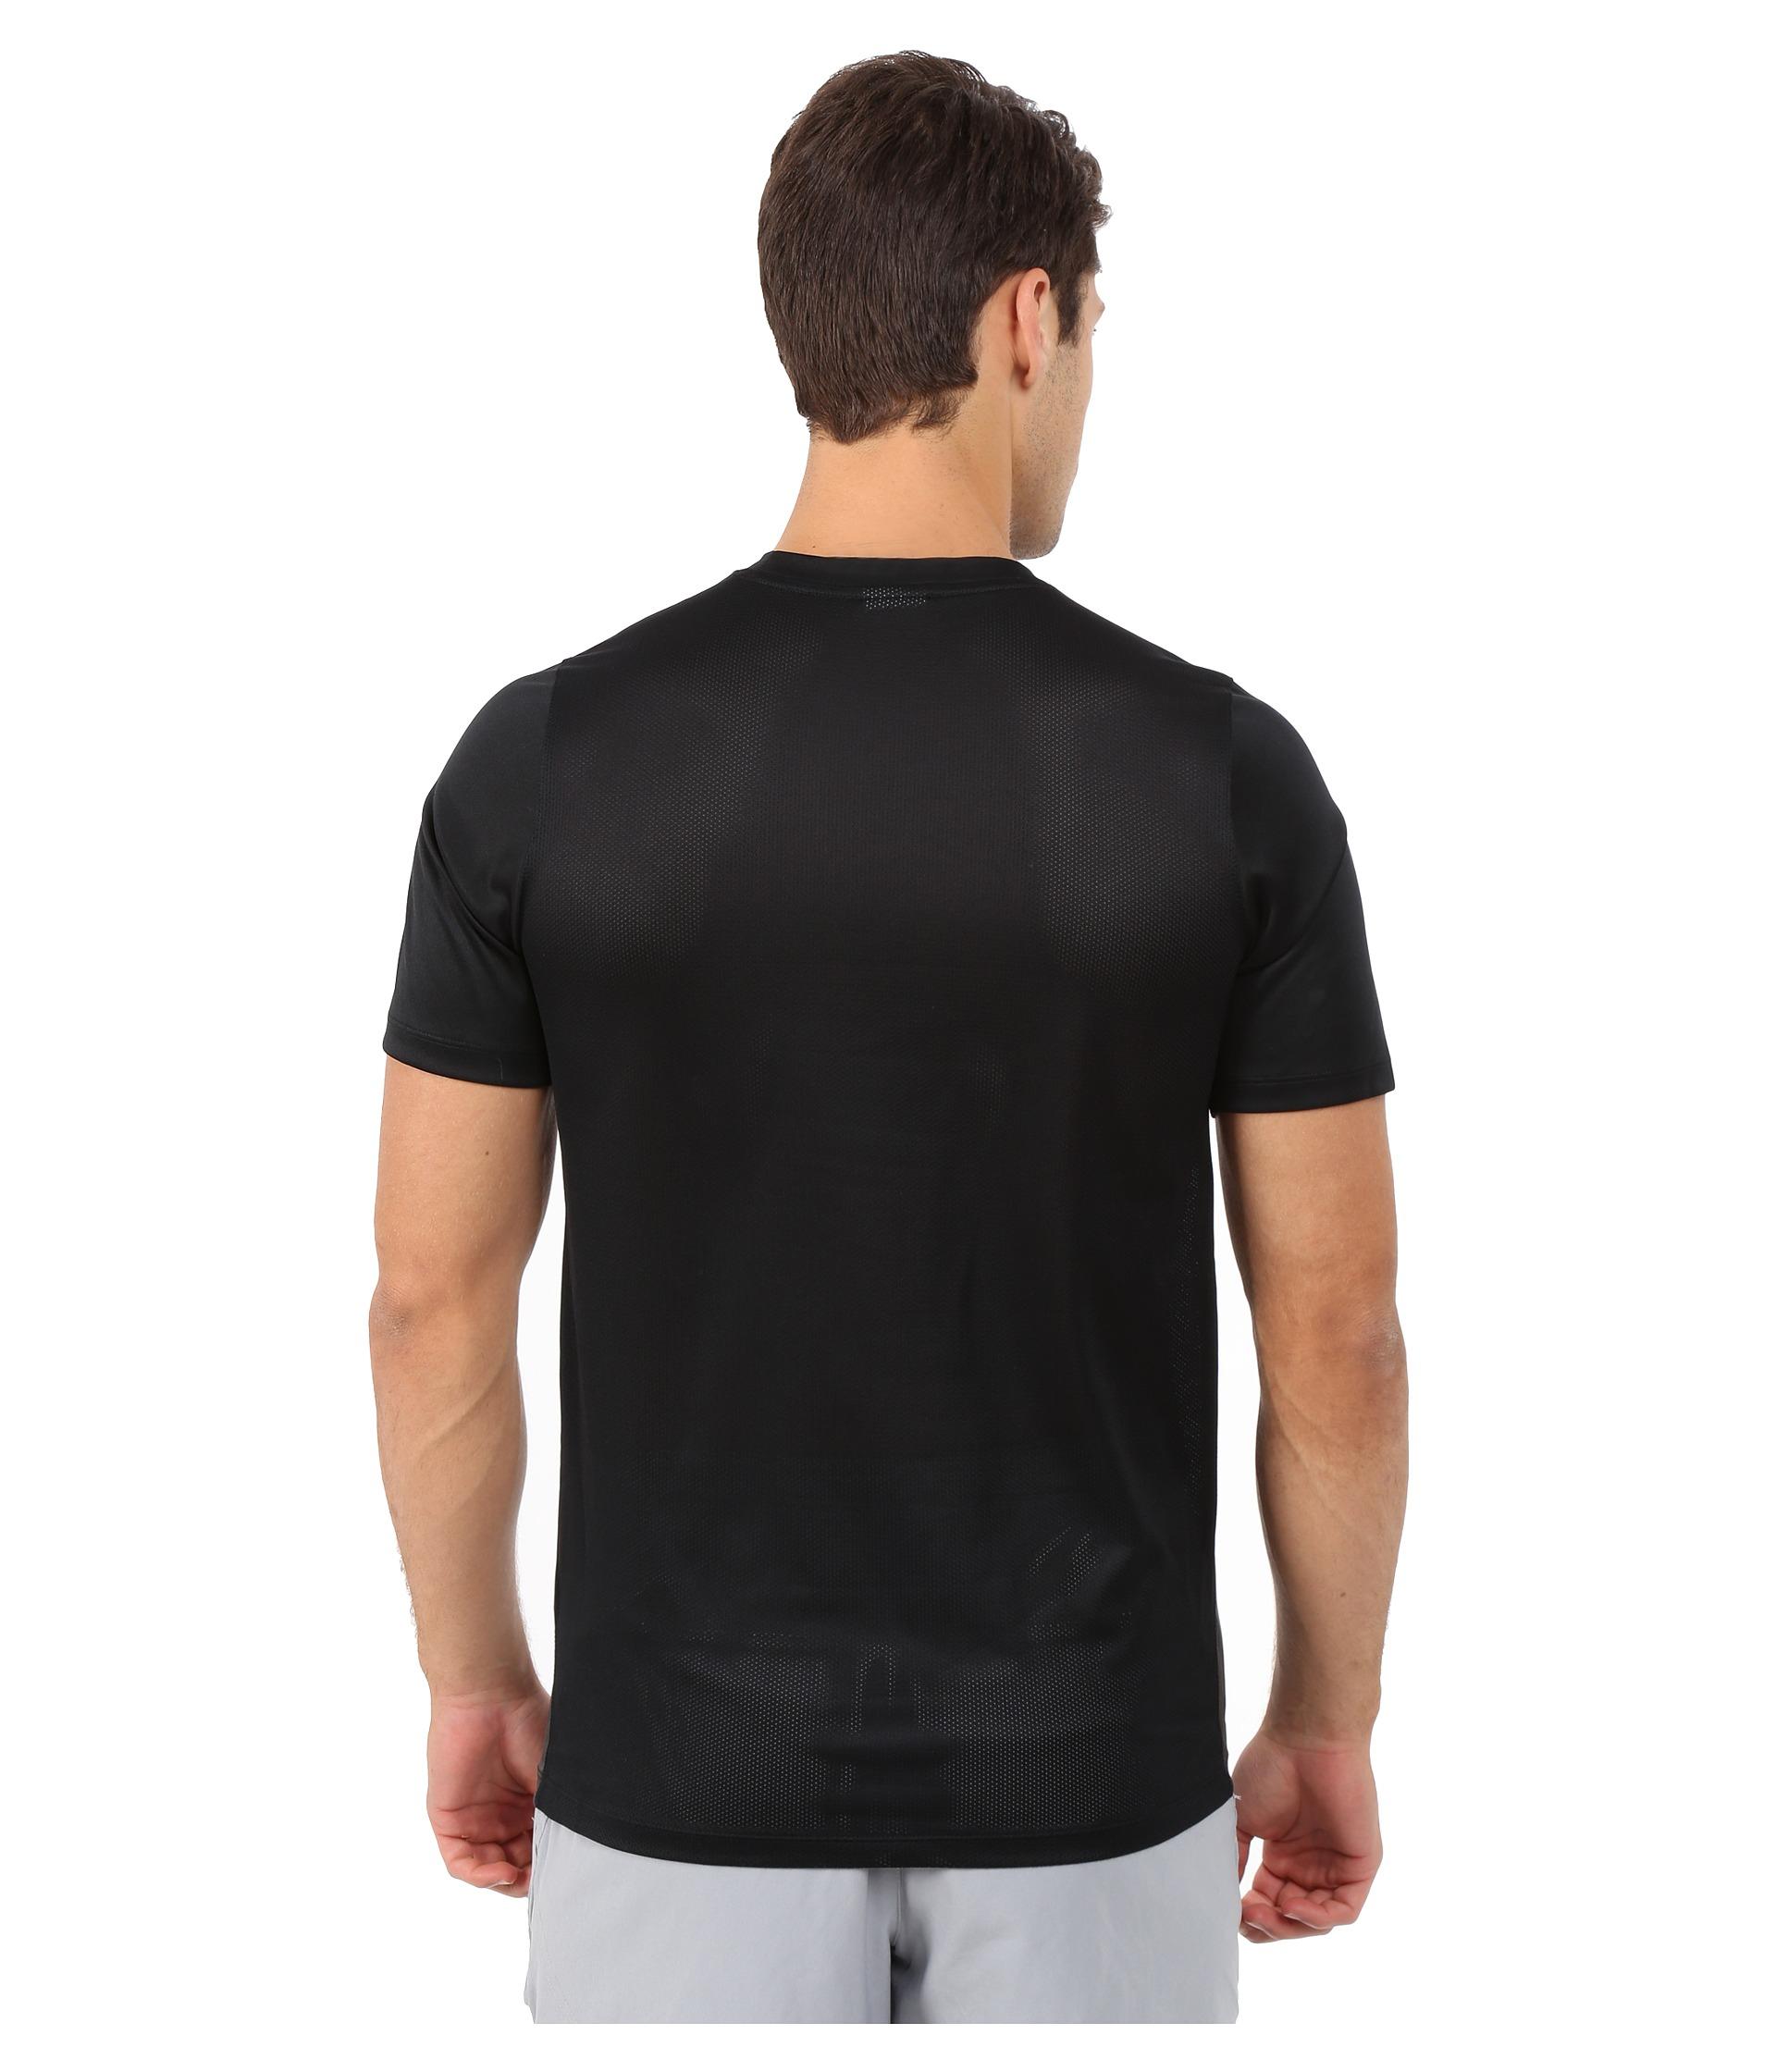 6ba4c69b5d ... half price 7a5d1 e17e3 Lyst - Nike Academy Ss Training Top 1 in Black  for Men ...